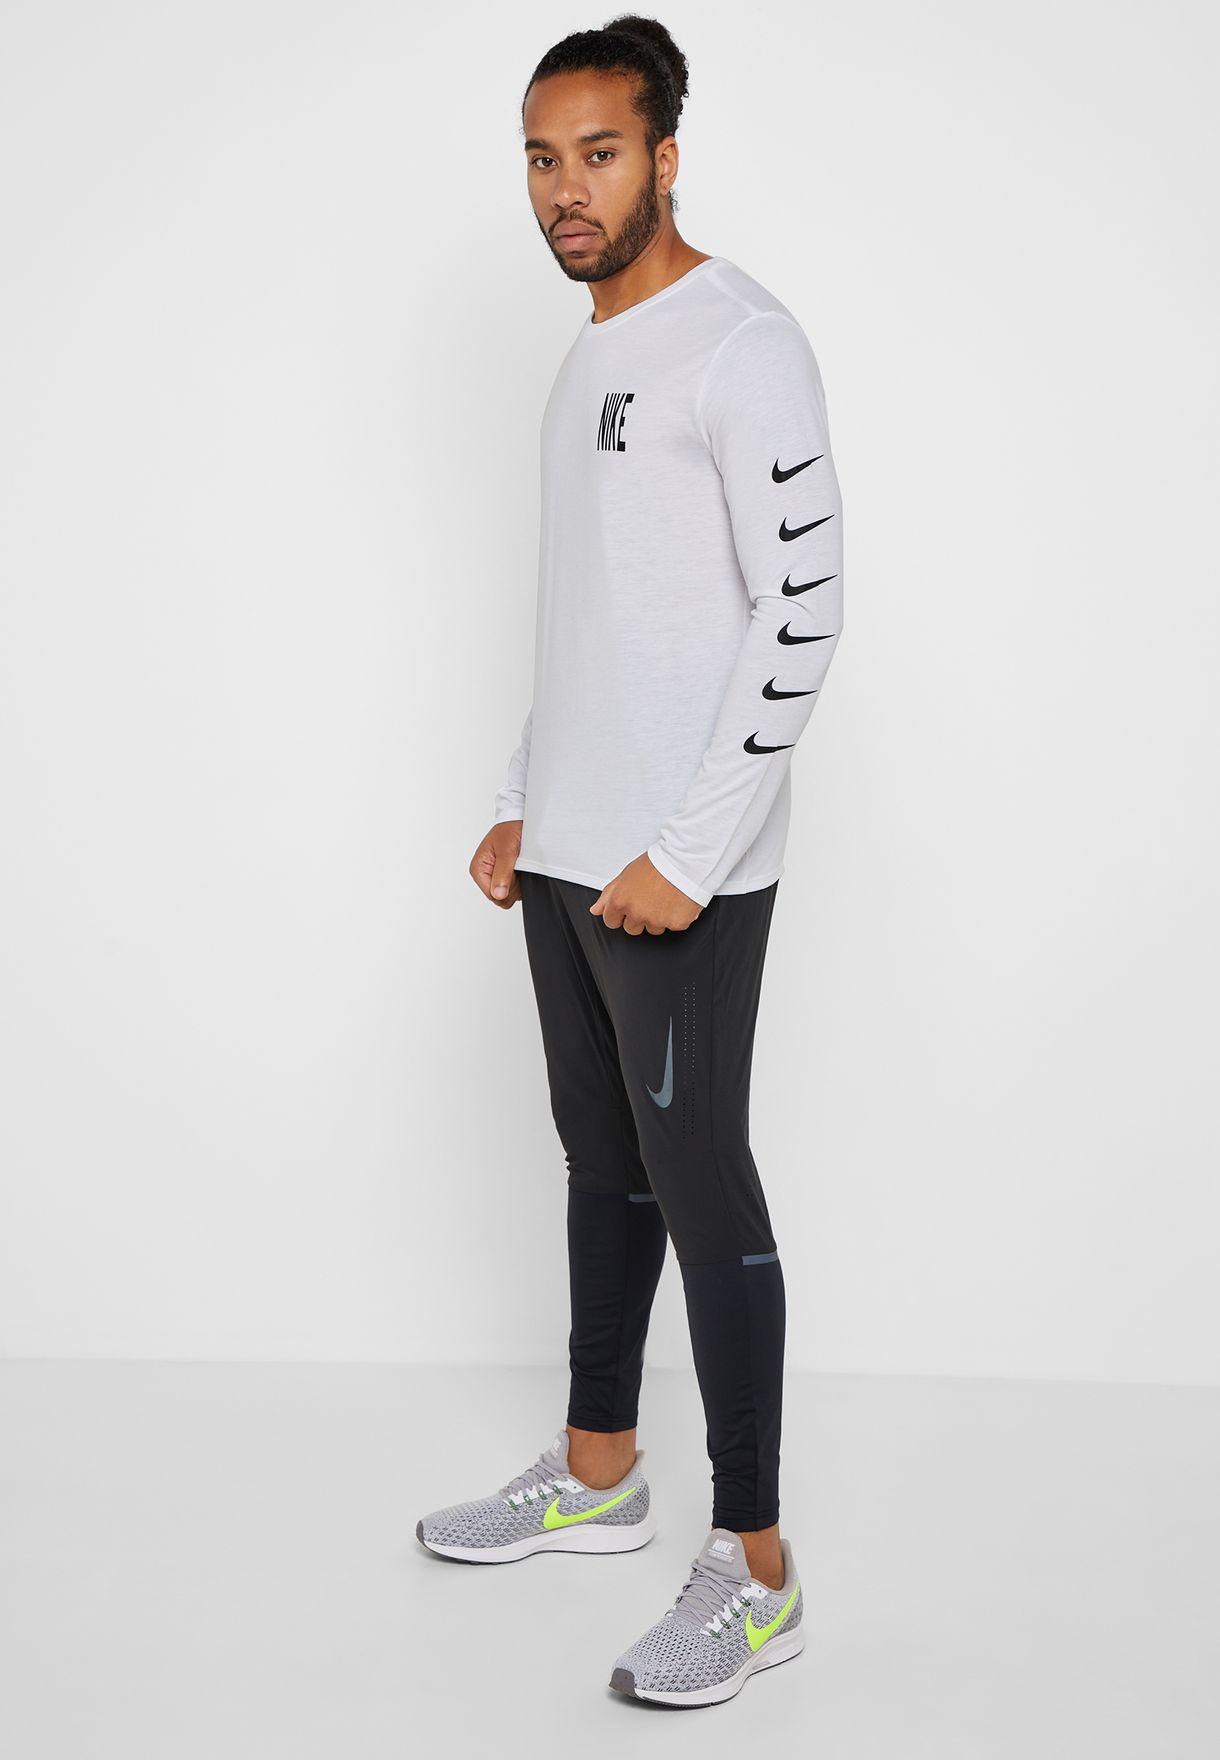 6edffe78 Shop Nike white Dri-FIT Run Division T-Shirt AA9445-100 for Men in ...